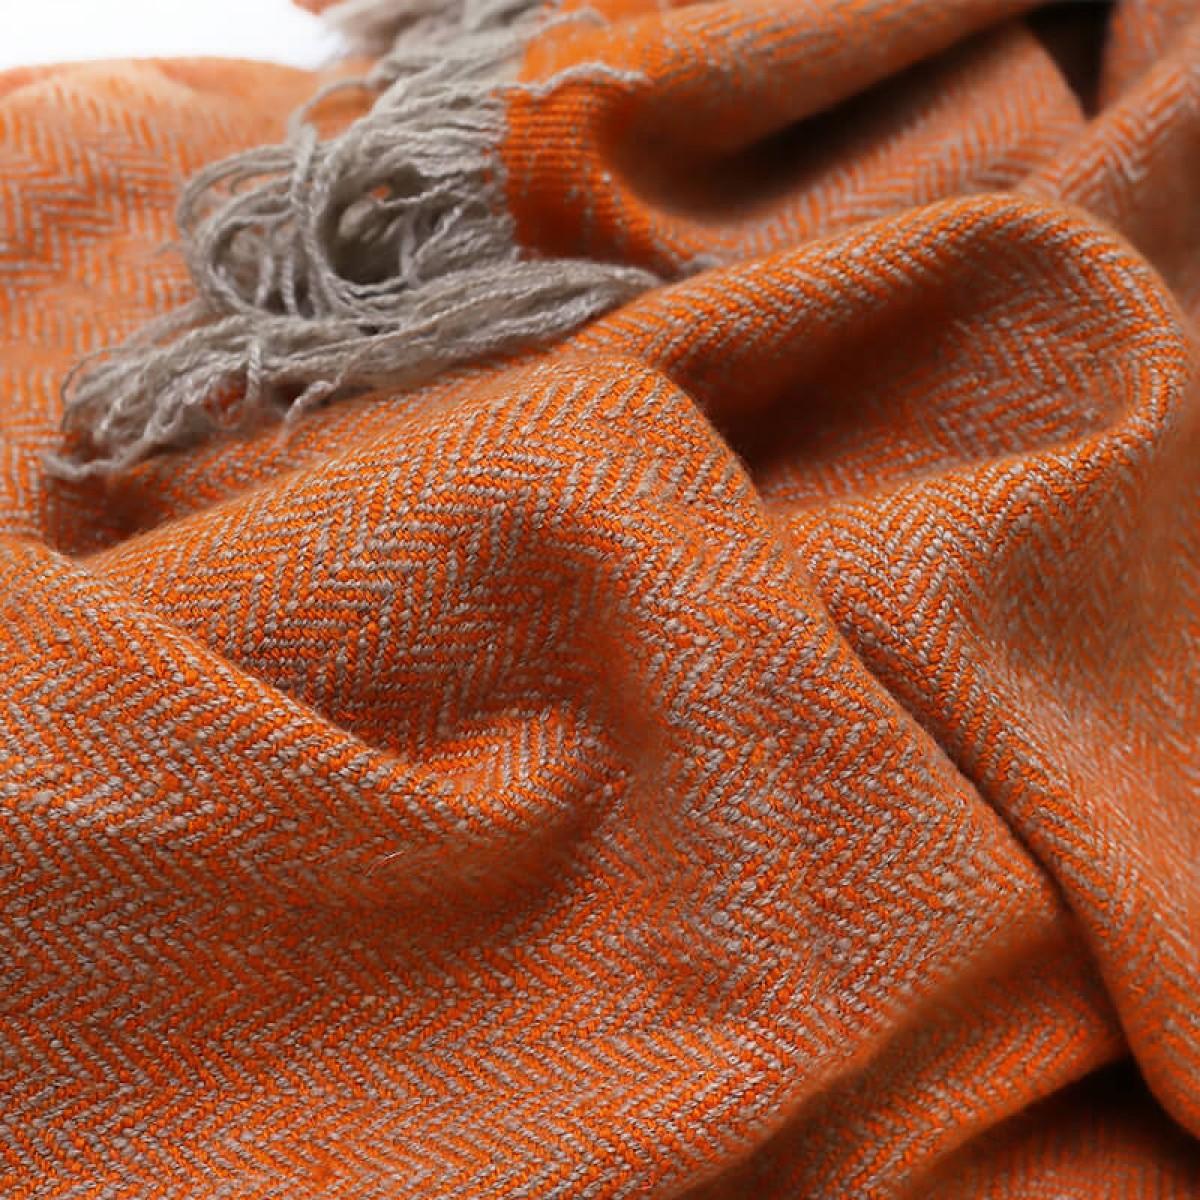 Cashmere Throw in Herringbone Weave - Mandarin (Made to Order)